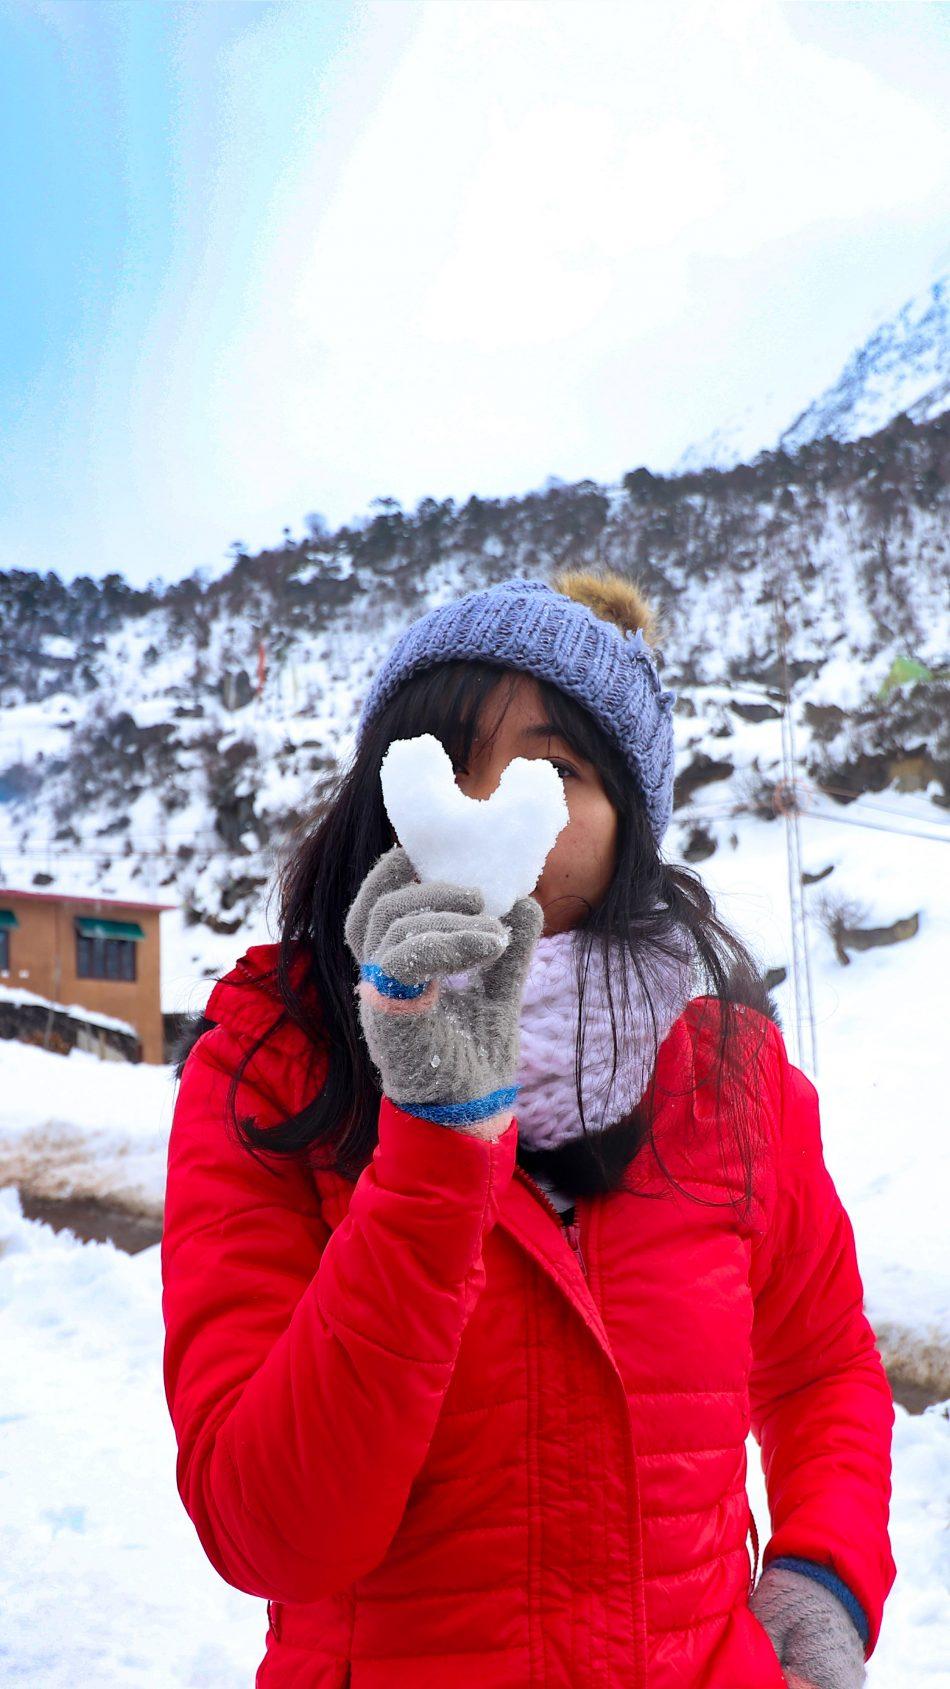 Snow Heart Girl Winter Photography 4K Ultra HD Mobile Wallpaper